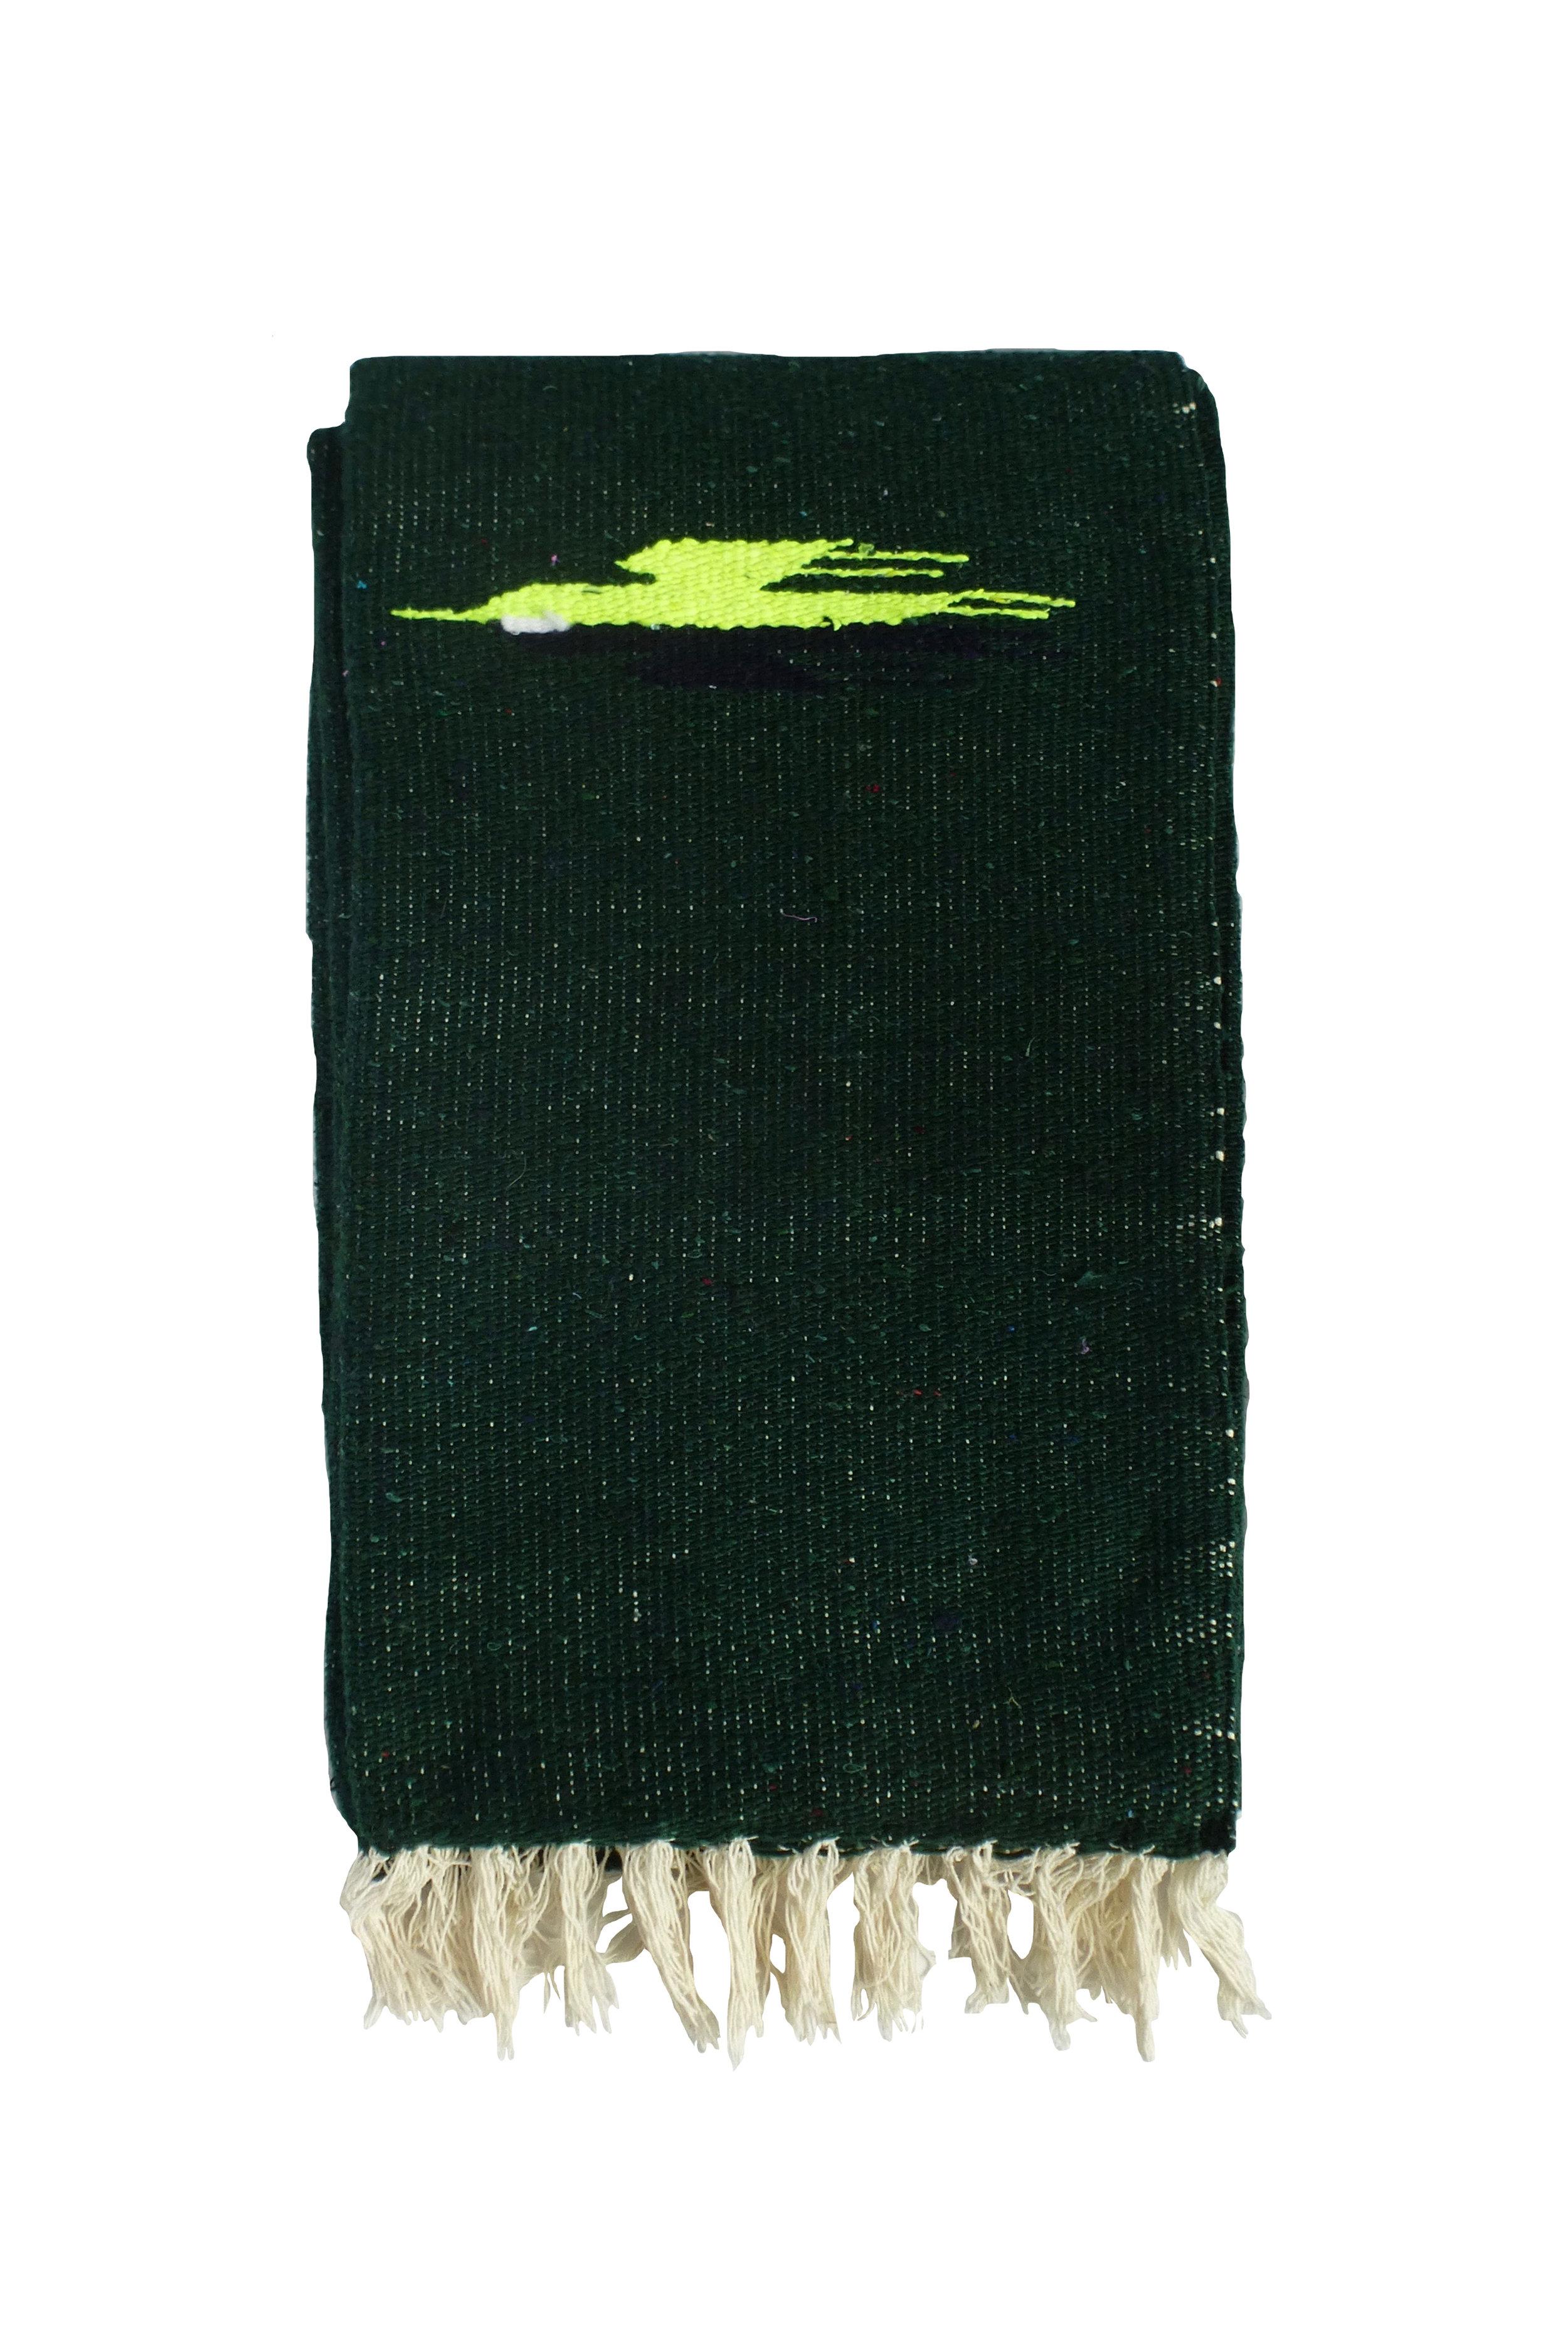 THUNDERBIRD BLANKET - GREEN